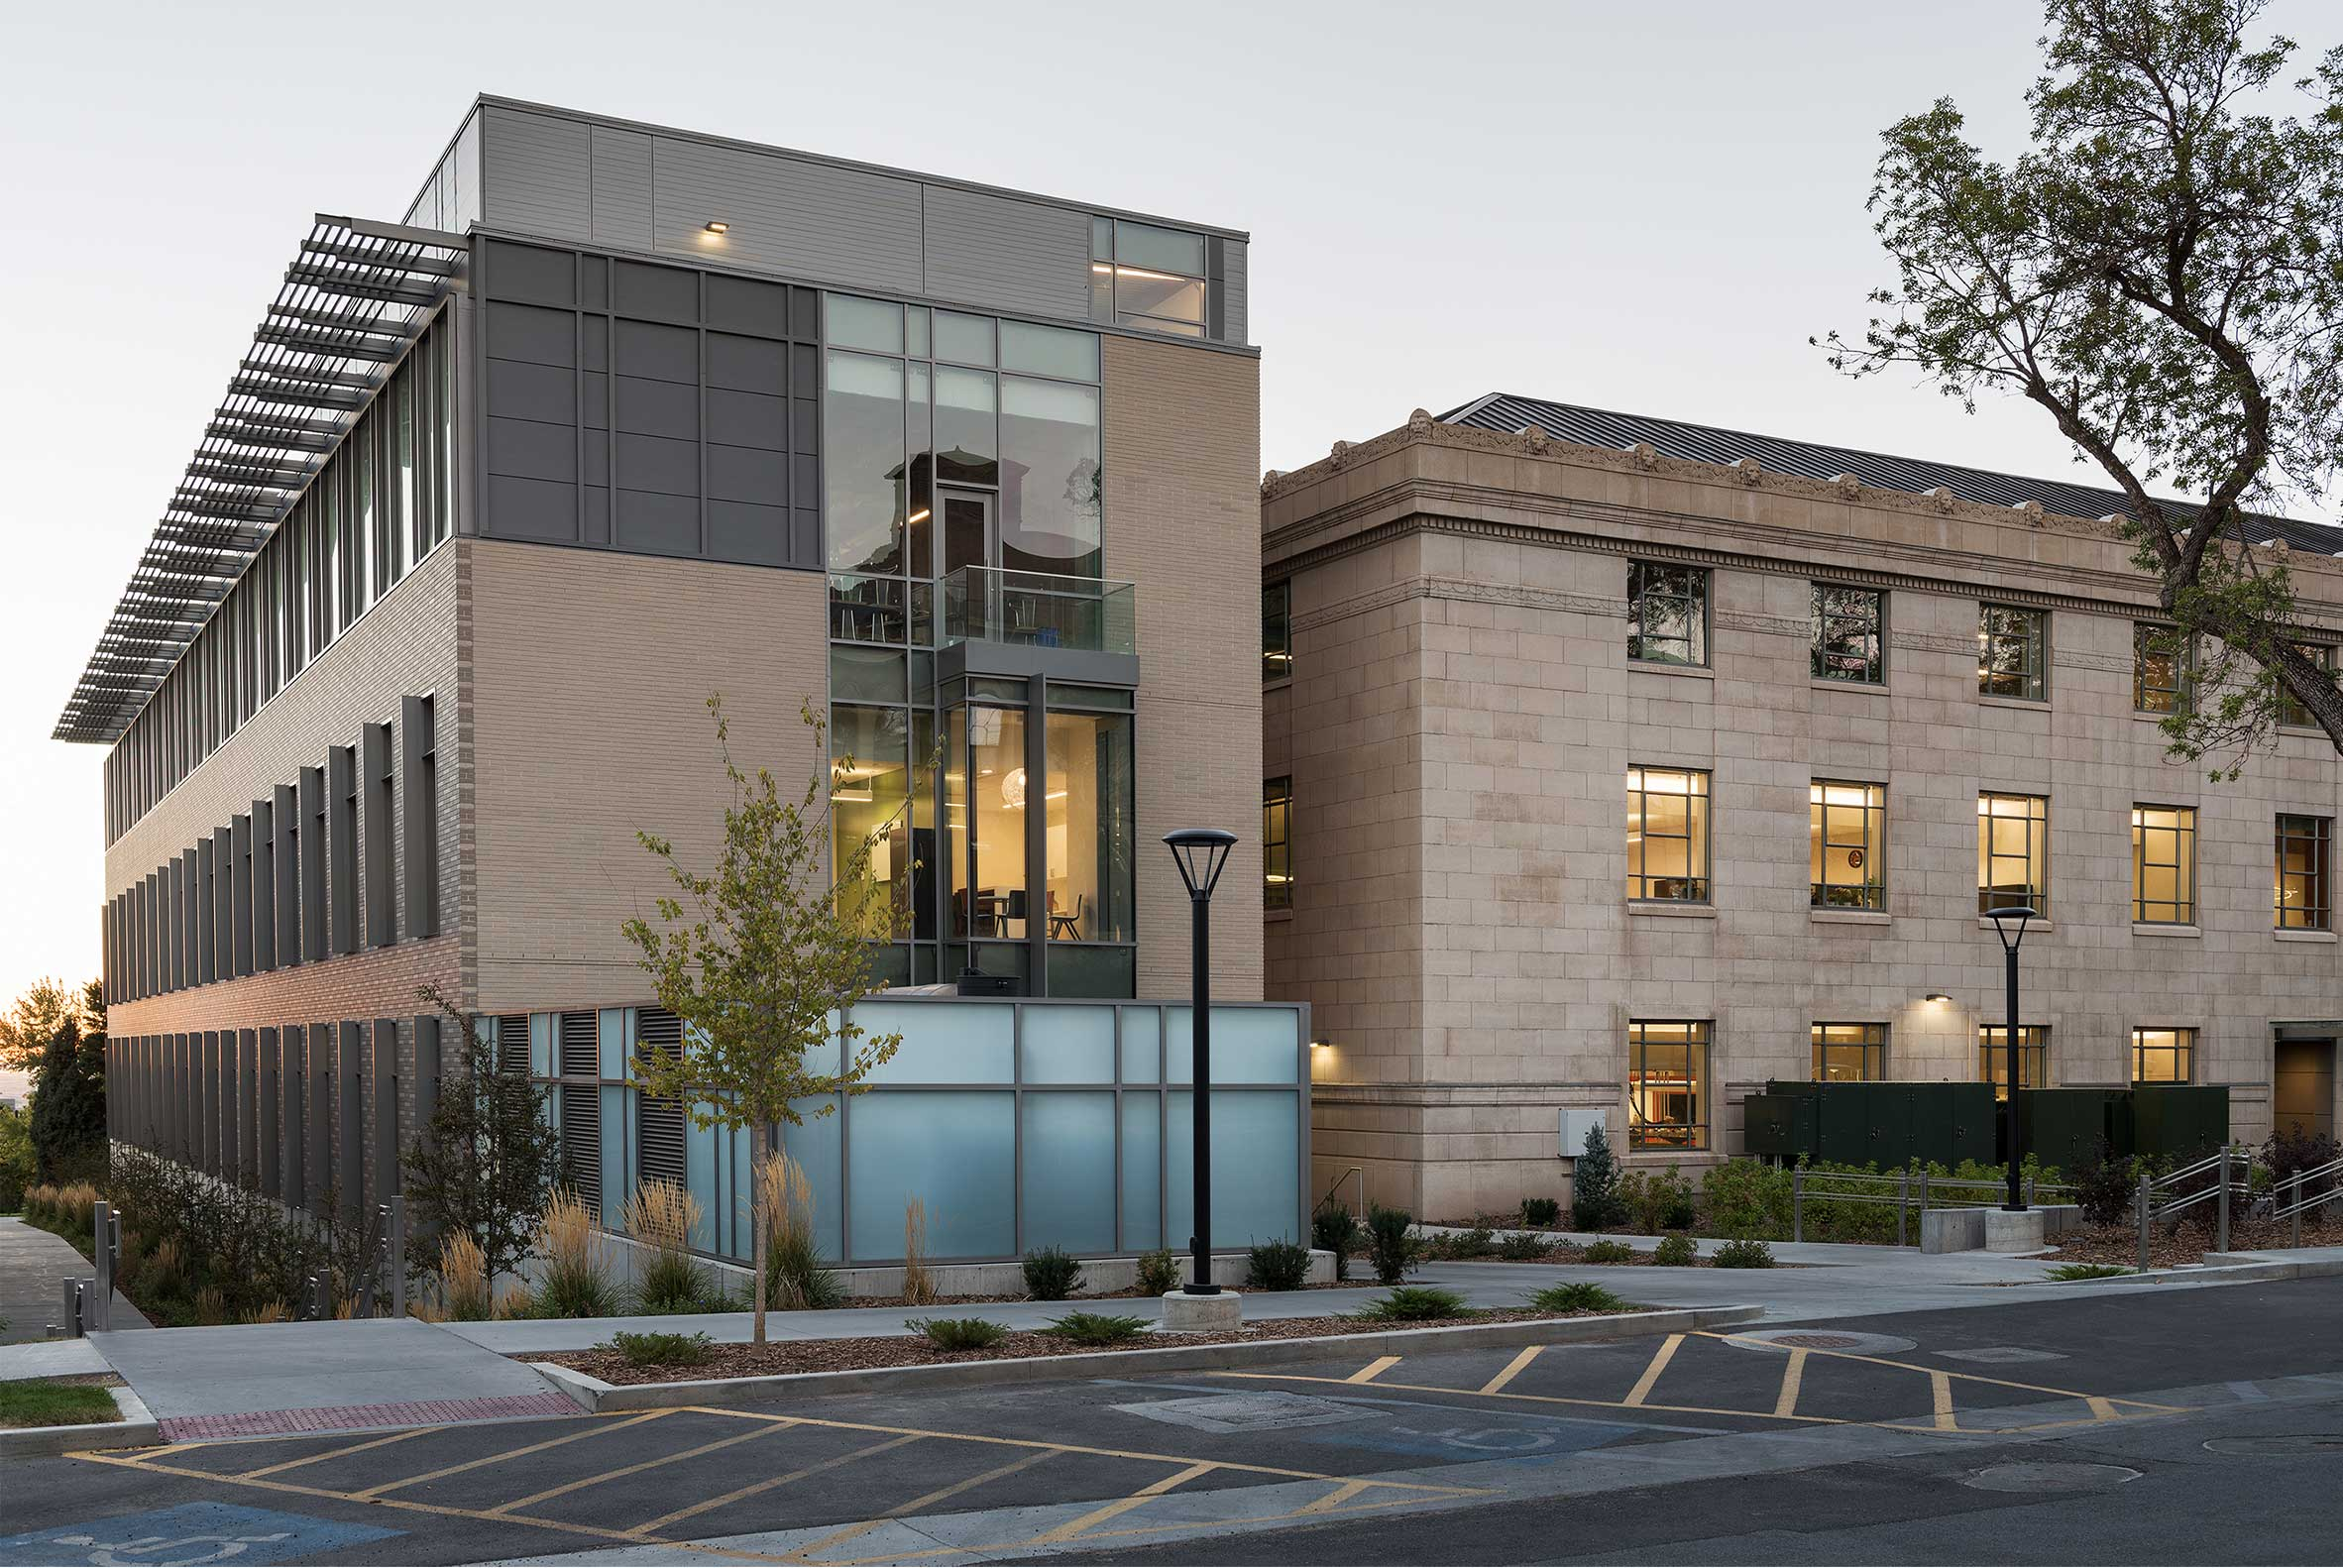 New Crocker Science Center Merges with Historic George Thomas Building at University of Utah, Salt Lake City